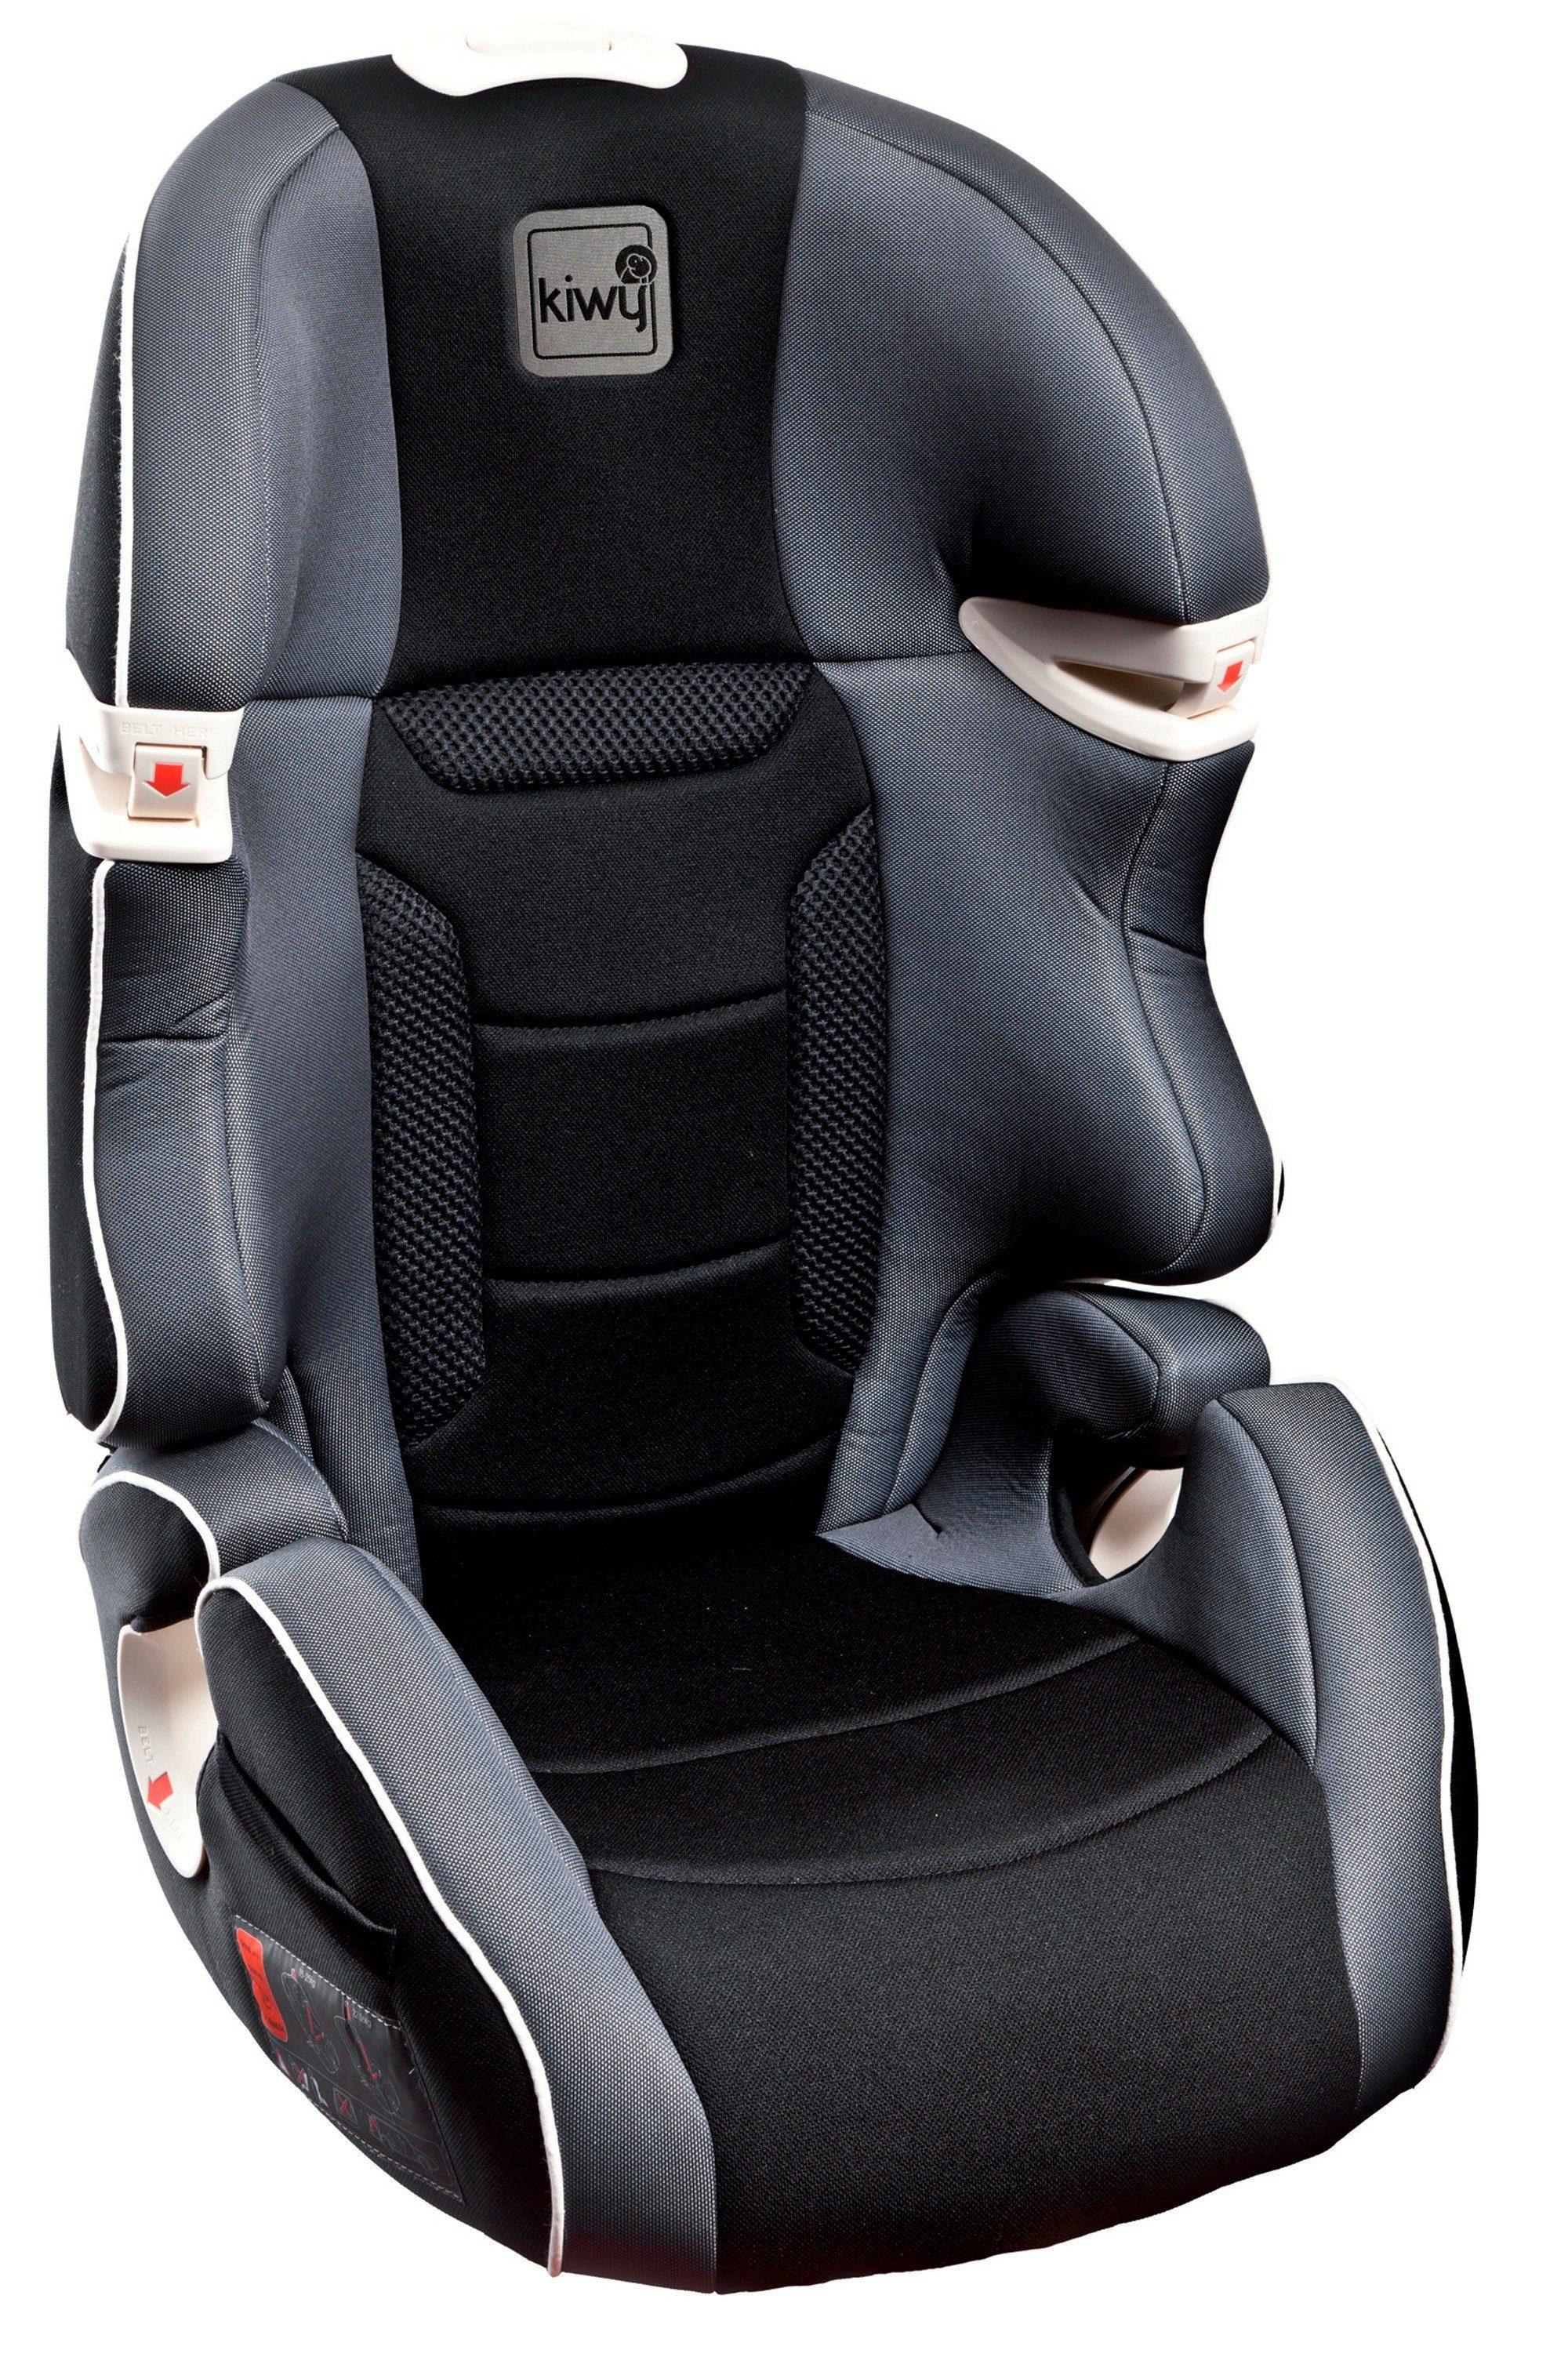 Kindersitz »SLF23«, 15 - 36 kg, mit Isofix